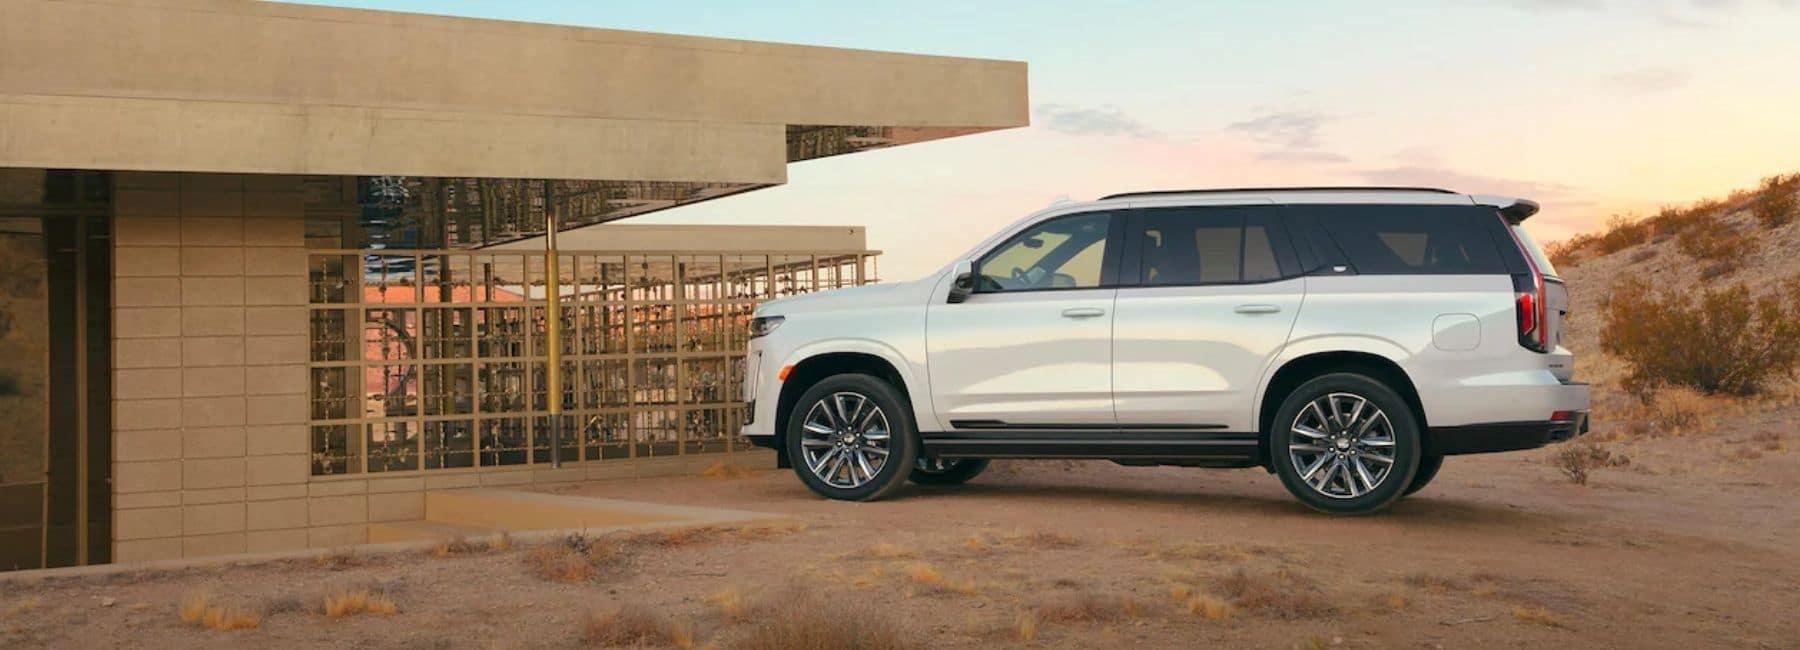 White 2021 Cadillac Escalade In Desert Next To A Building - Cadillac Dealer Near Las Cruces, NM